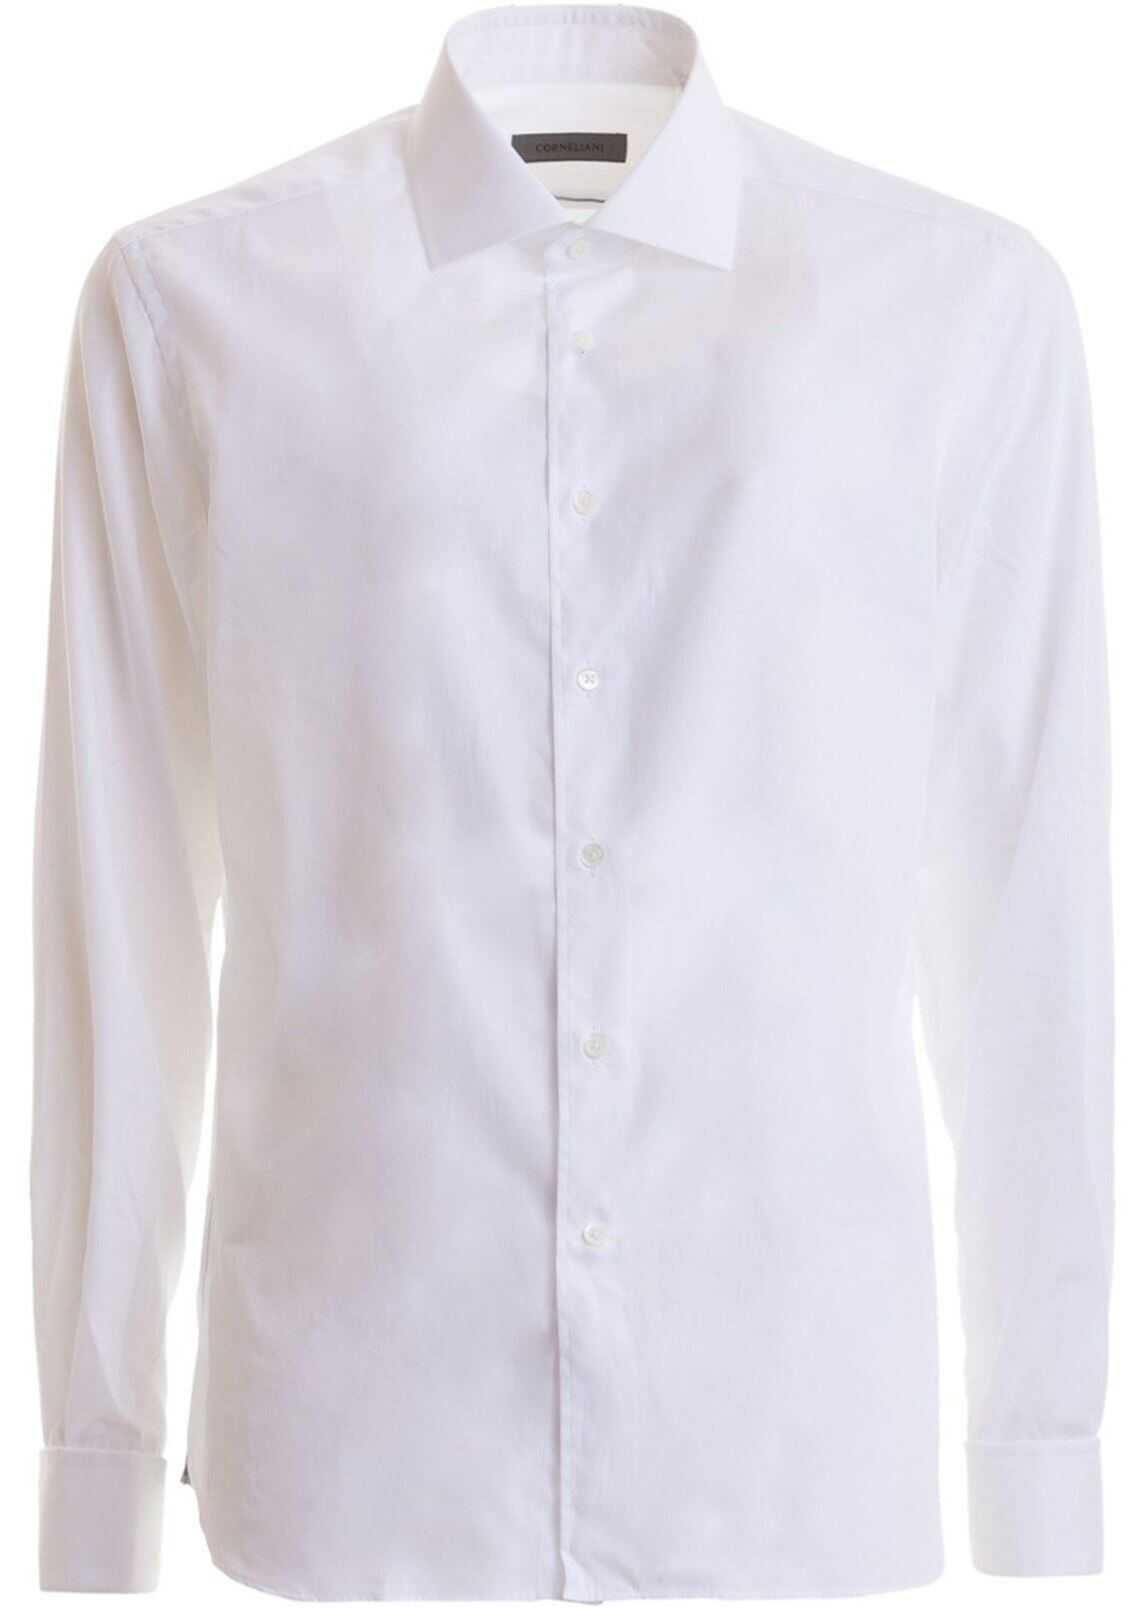 CORNELIANI White Cotton Shirt With French Cuffs In White White imagine